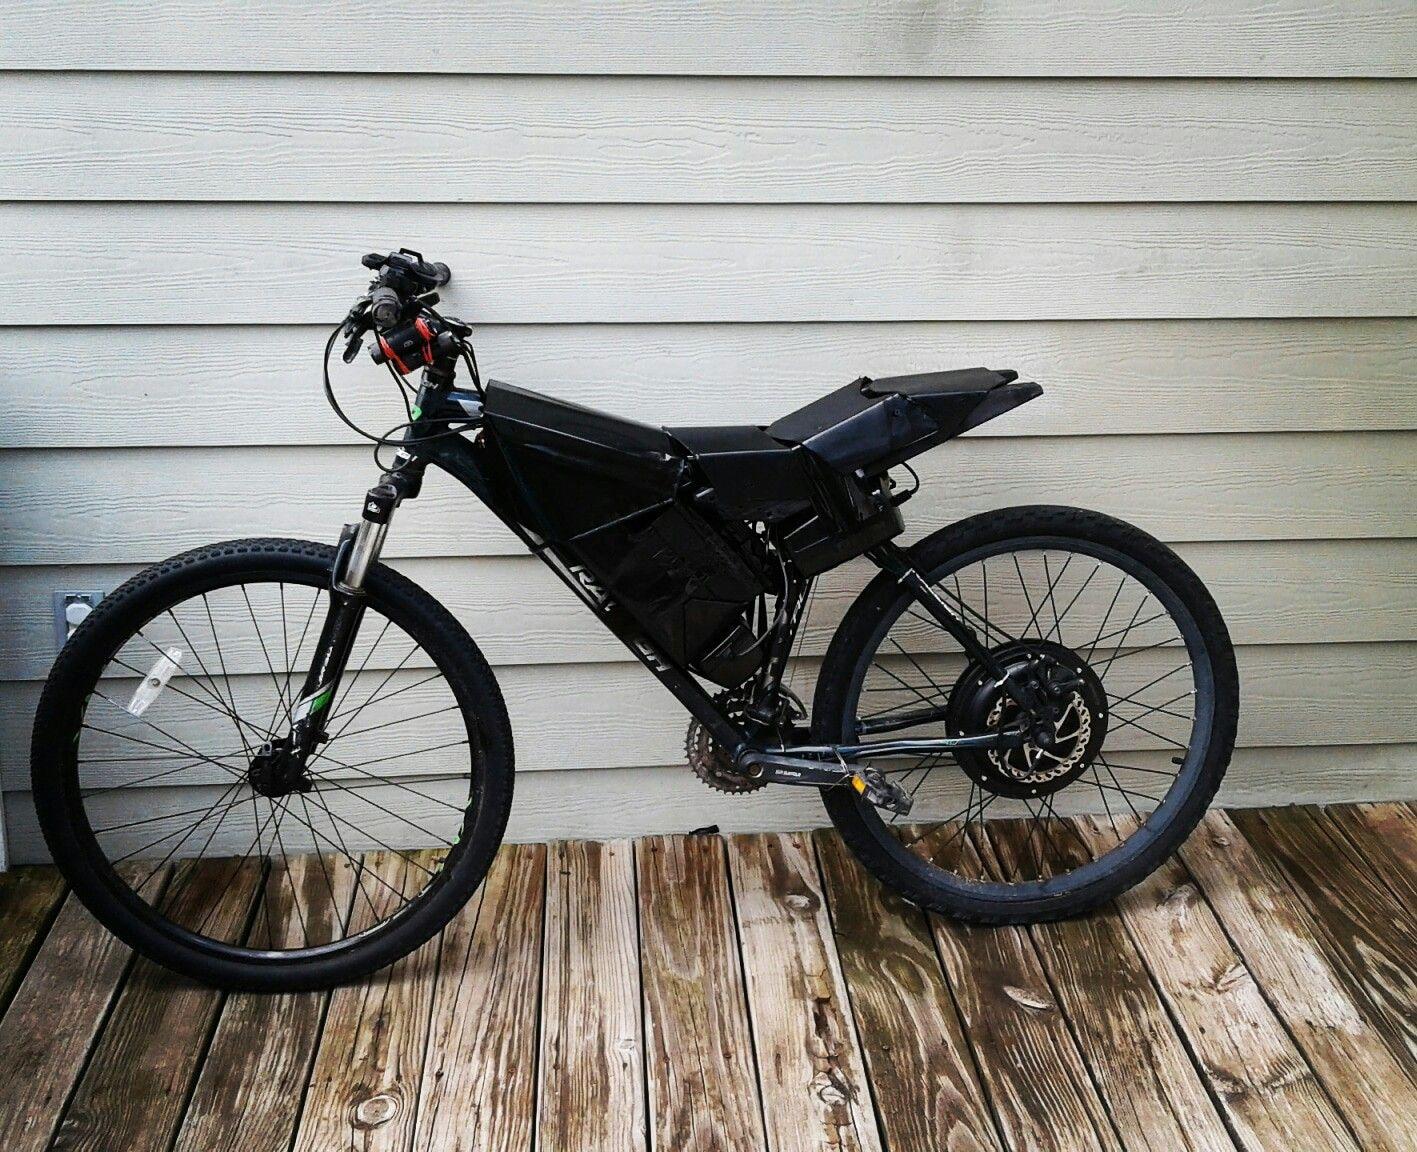 7ba0919ee03 Diy Electric Bike. 20ah sla battery, 36v 500w controller. Throttle drive  only.